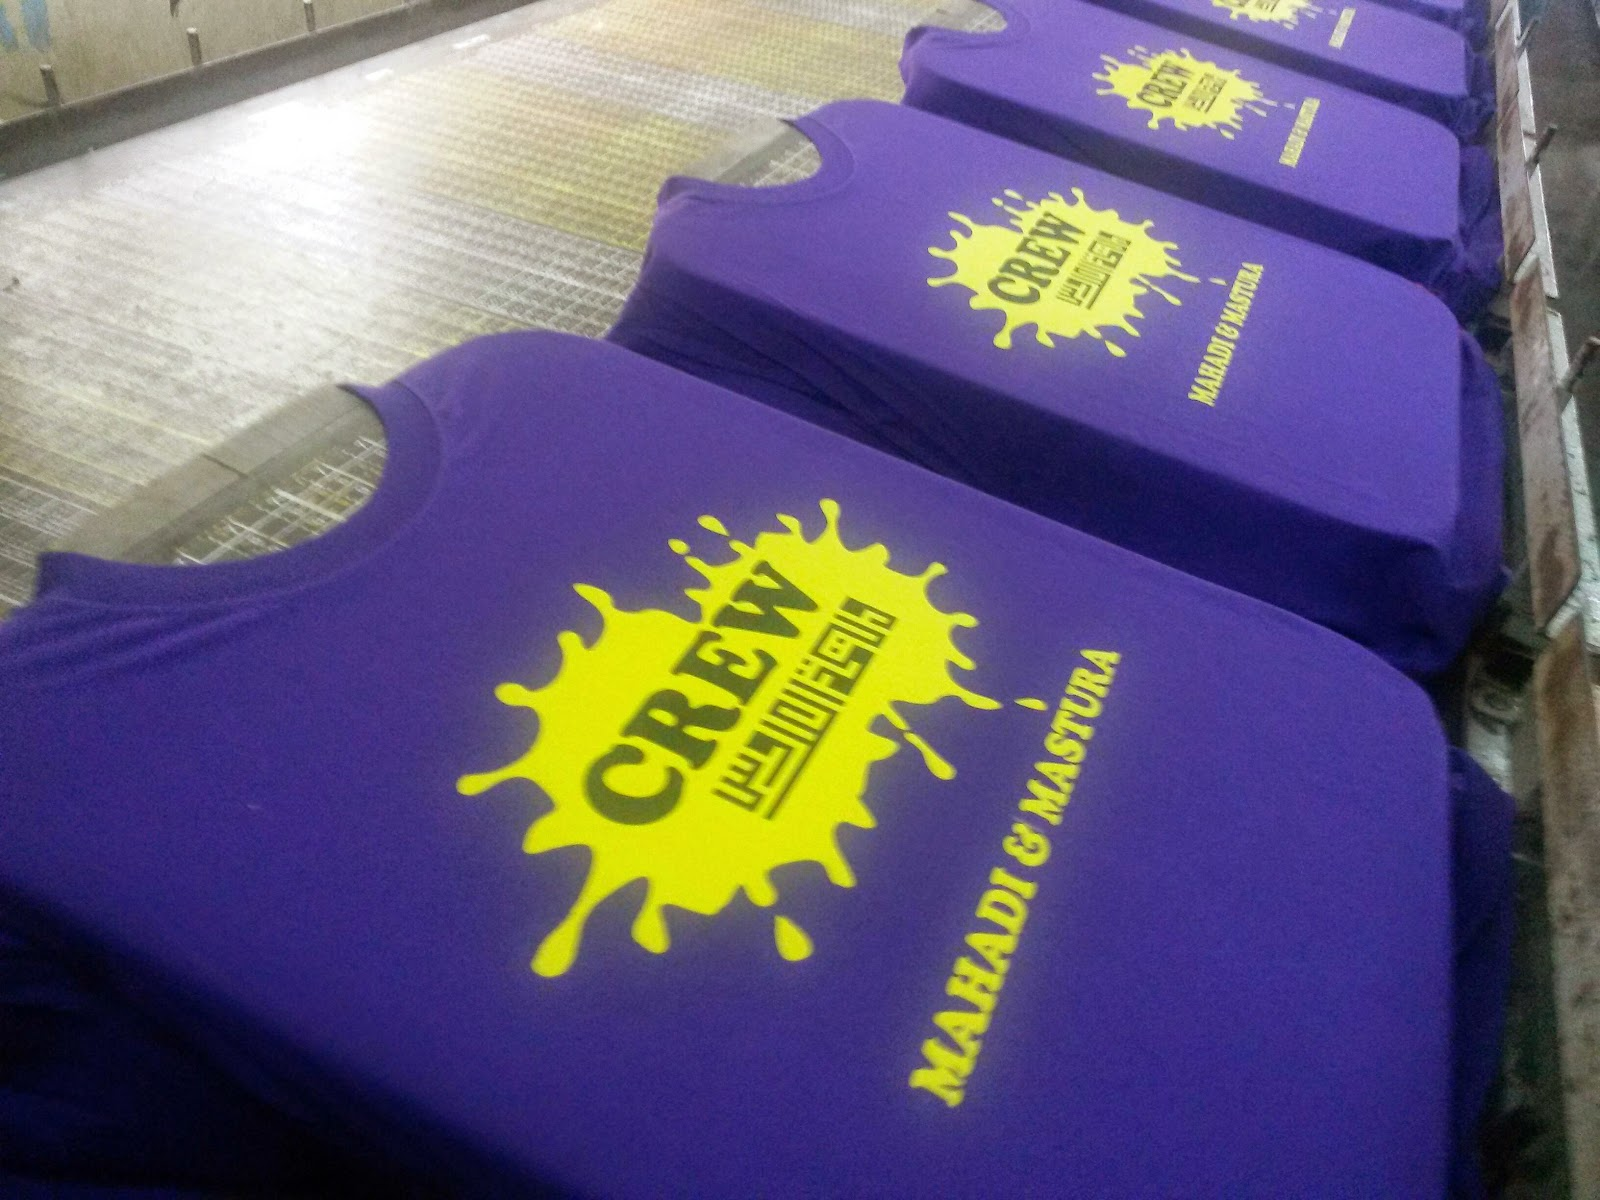 Design t shirt rewang -  Your Design We Do Untuk Tempahan Tshirt Printing Hubungi Kami 0132850982 Call Whatsapp Rewangcrew Rewang Walimatulurus Perkahwinan Tempahbaju